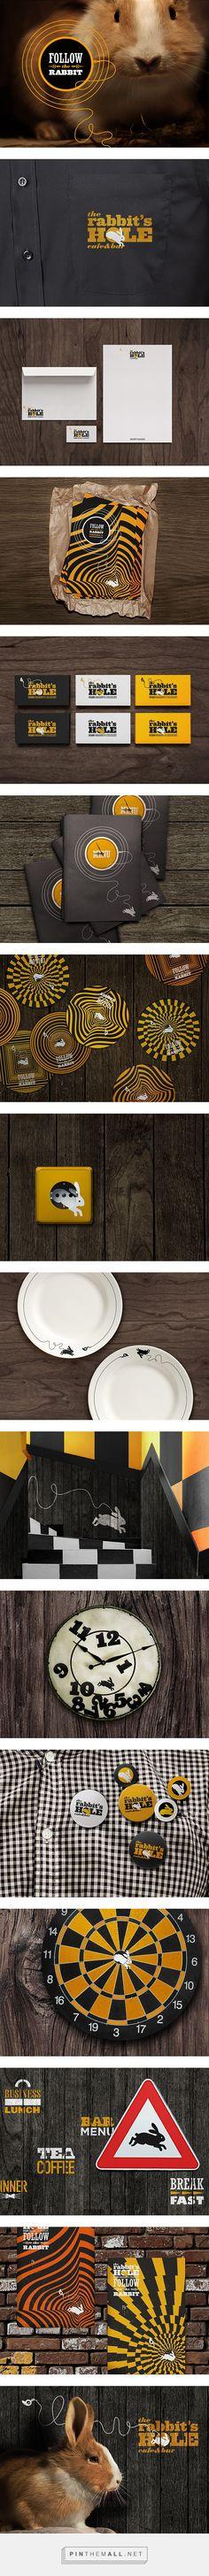 The rabbit's hole on Behance | Fivestar Branding – Design and Branding Agency & Inspiration Gallery